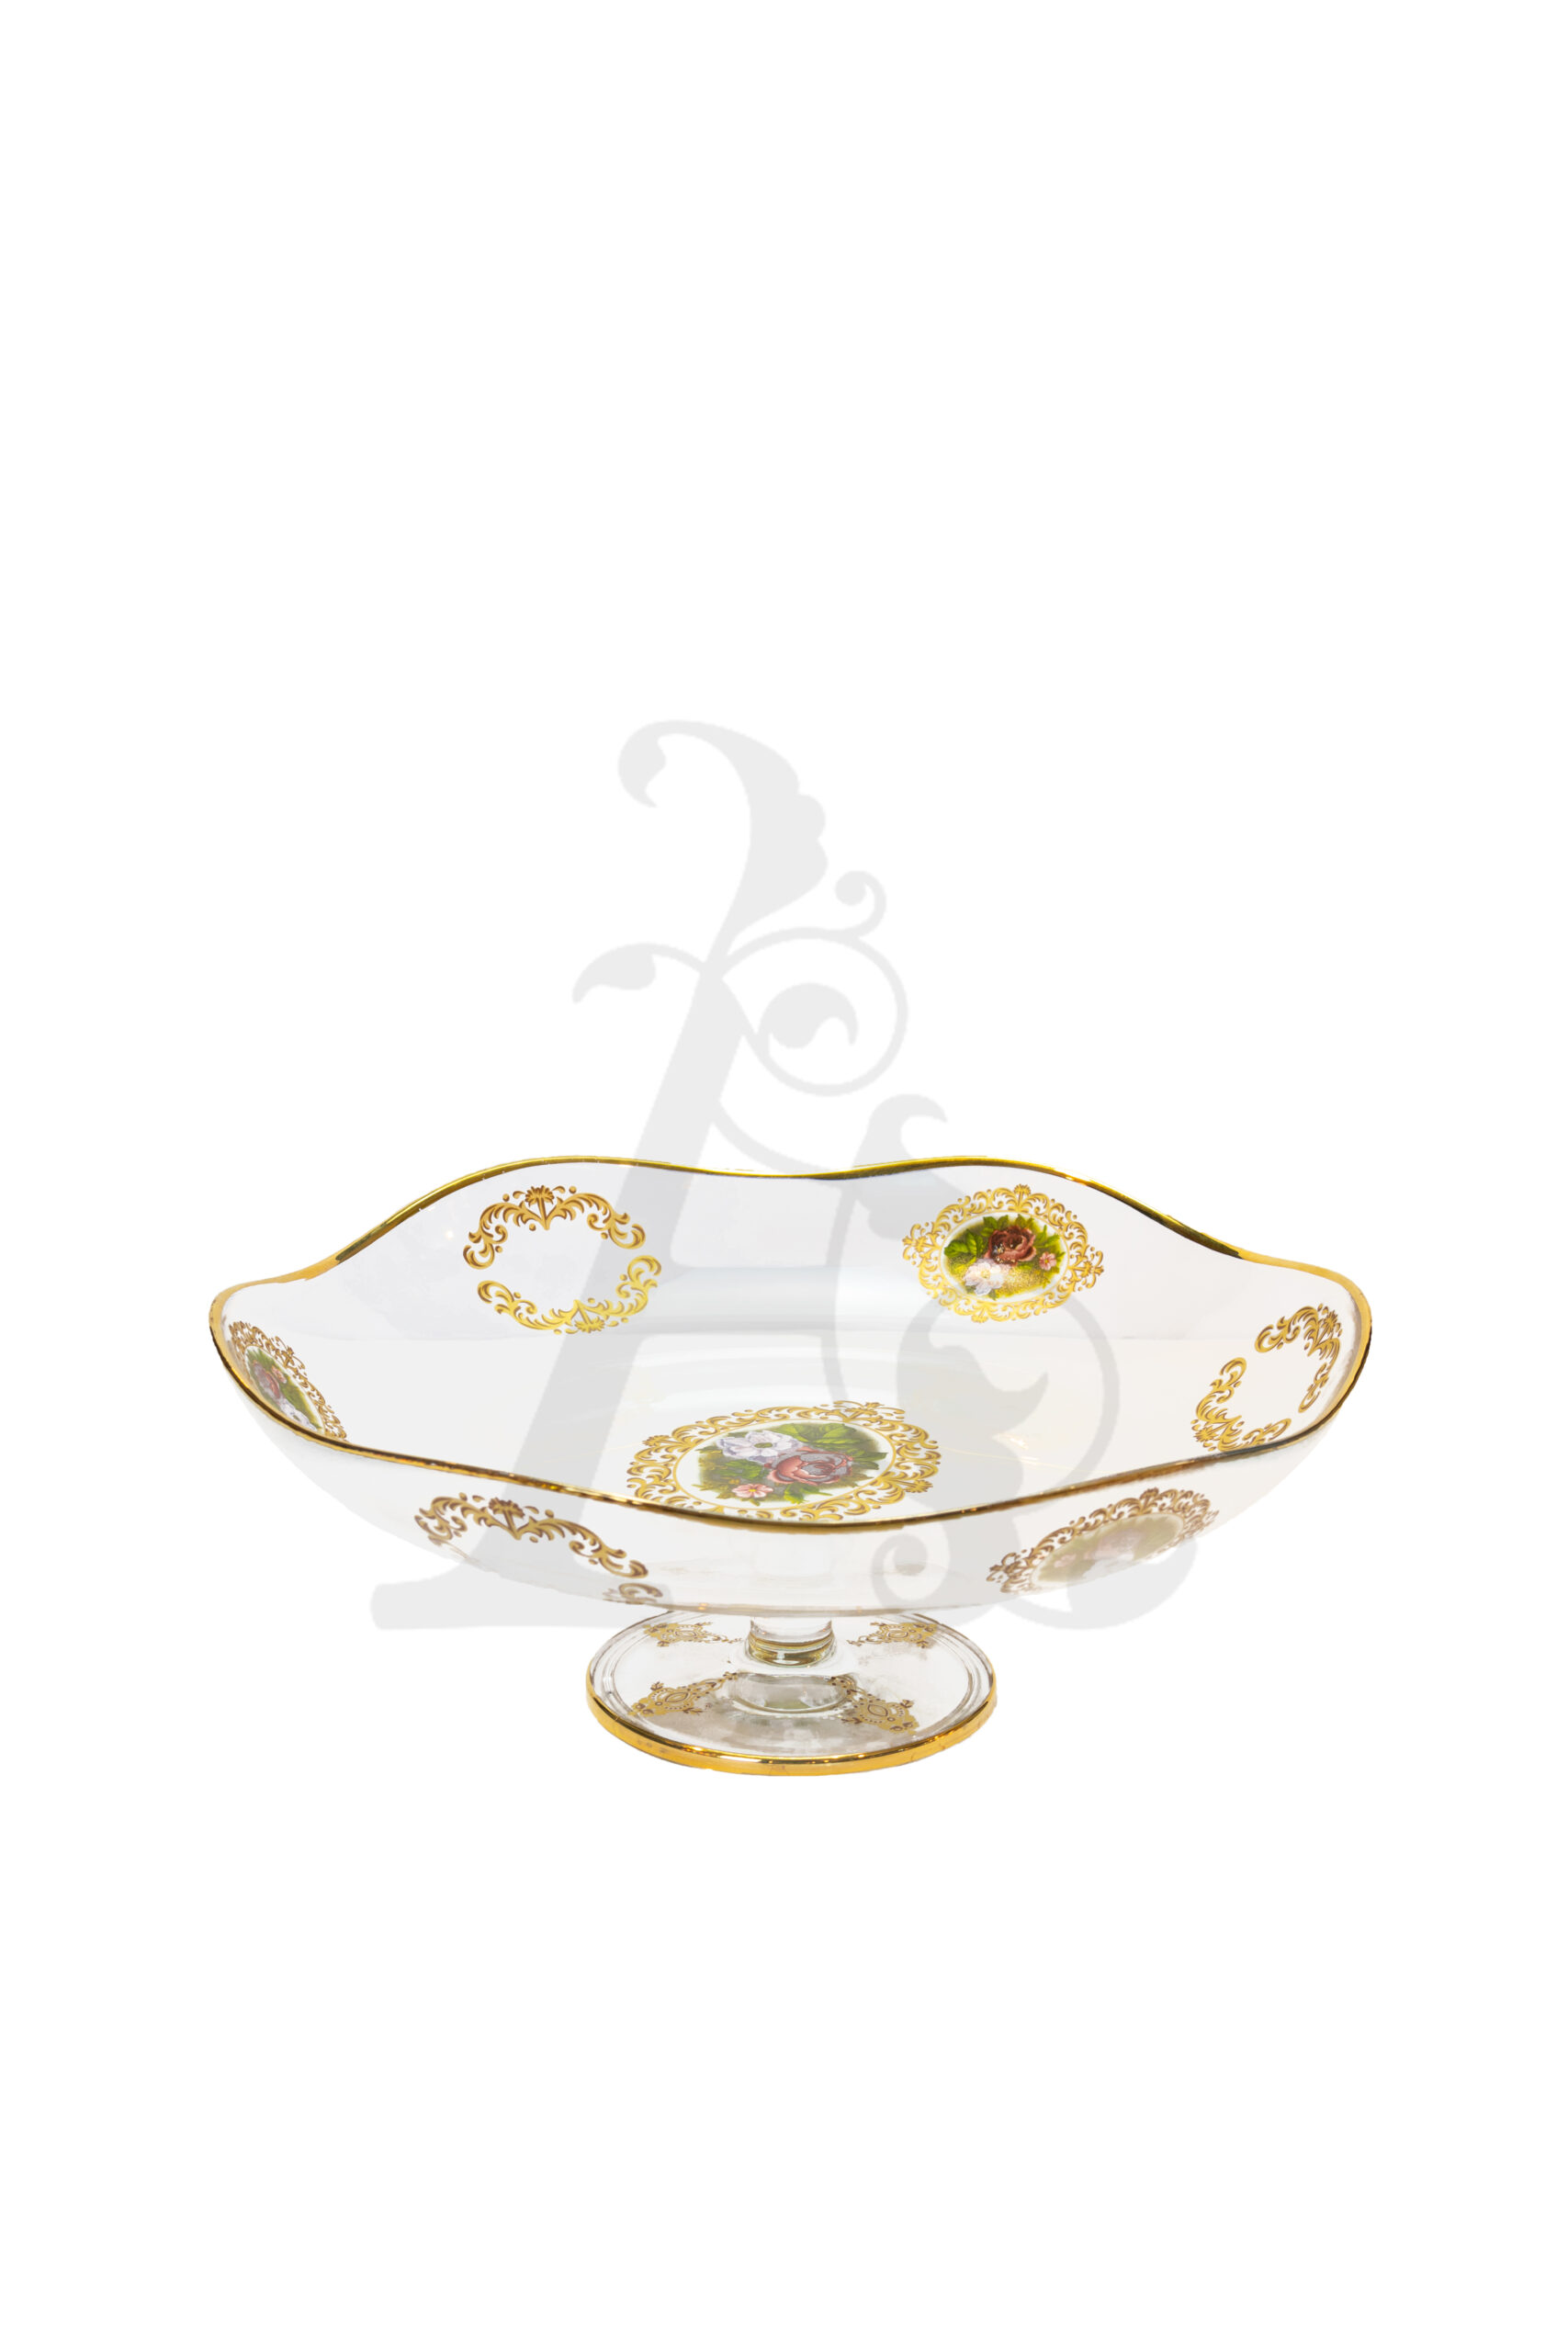 Buy Floral Dessert plate 95790